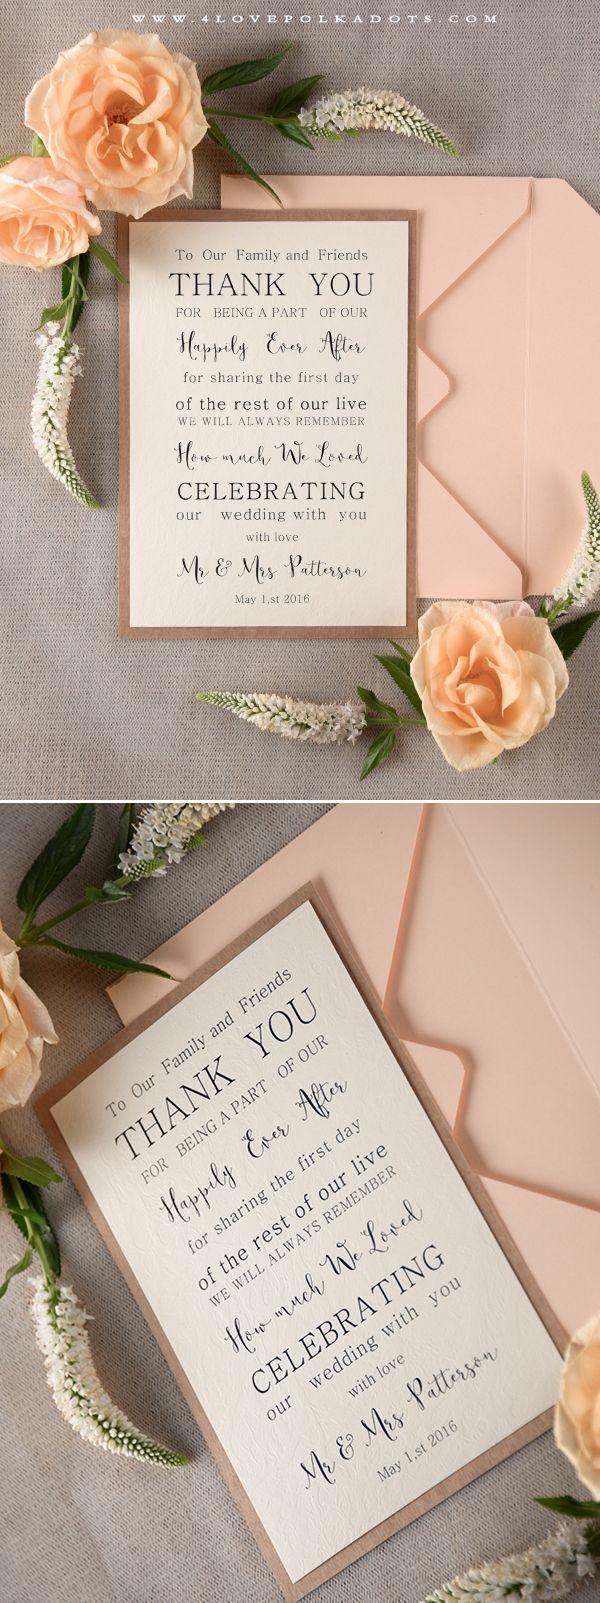 Modest Romantic Wedding Thank You Card #thankyou #romanticwedding #summerwedding